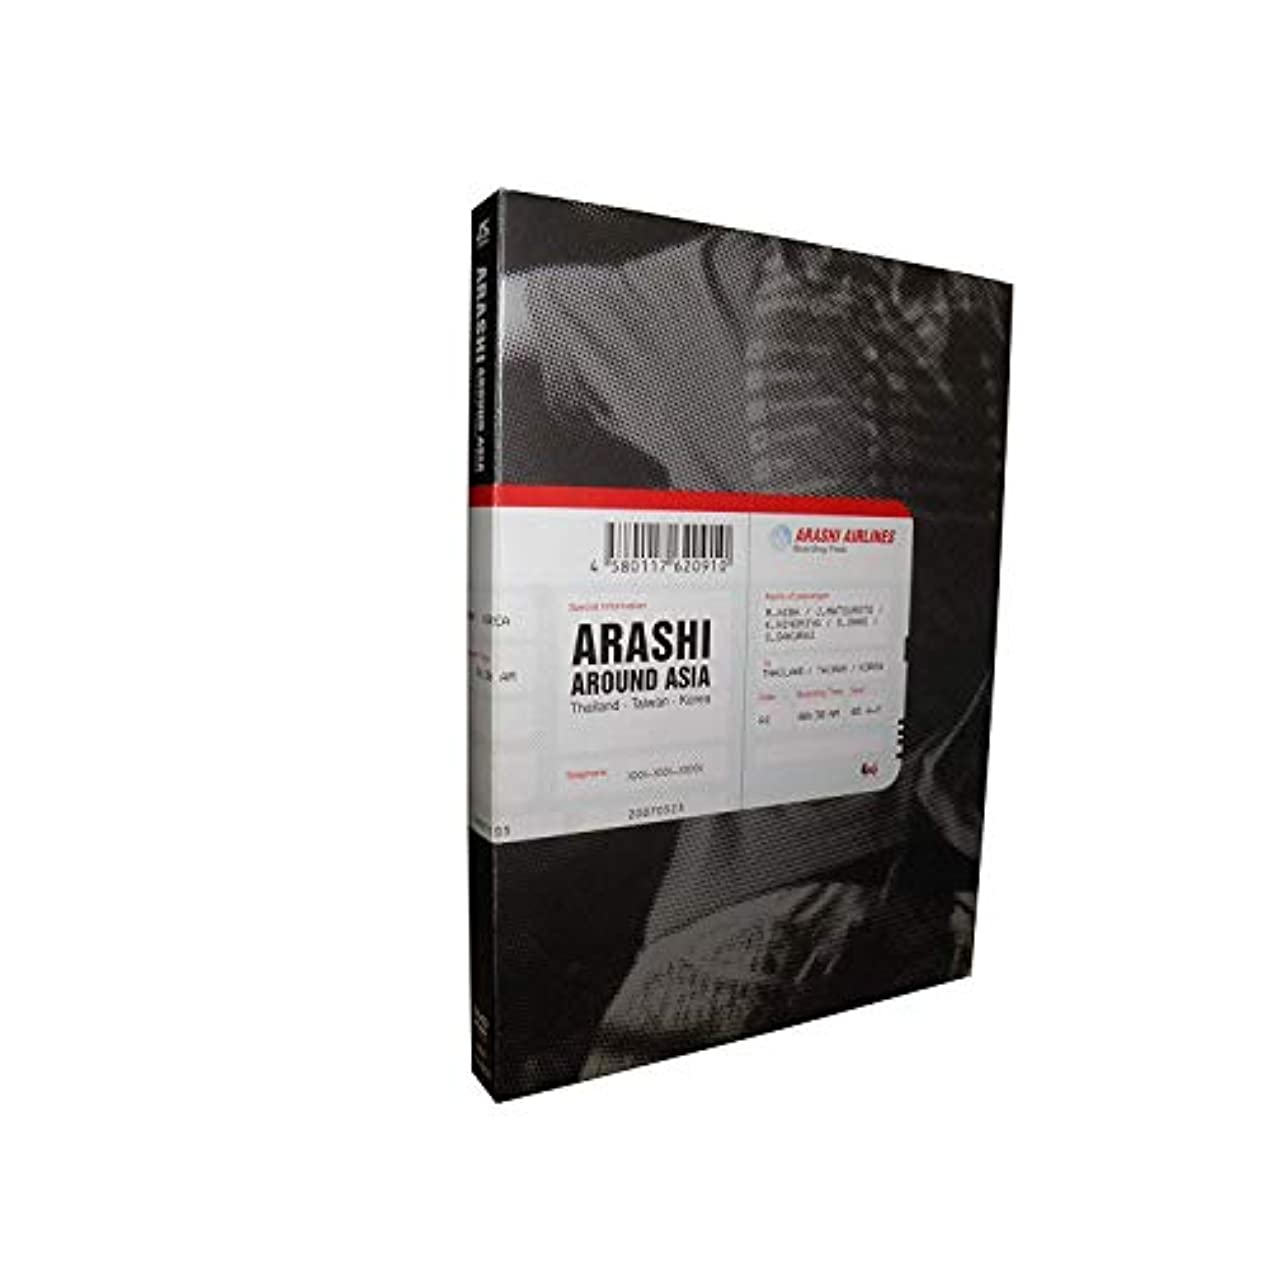 経済女の子贅沢ARASHI AROUND ASIA 【初回生産限定盤】 [DVD]